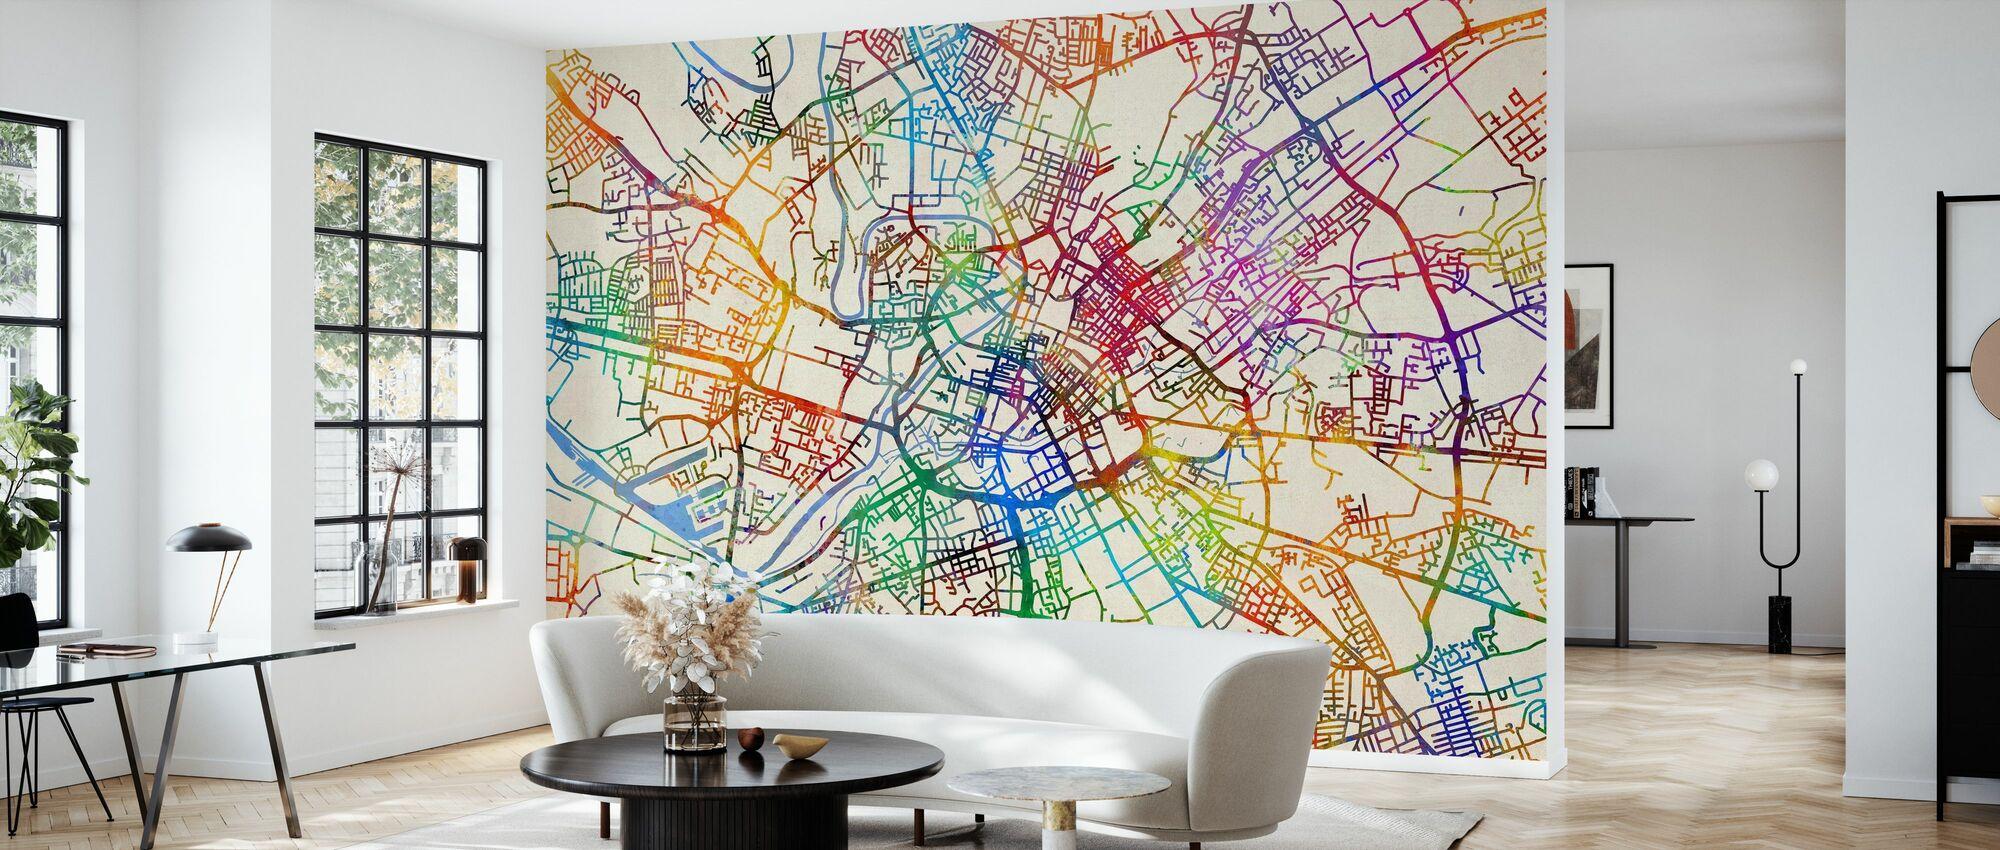 Manchester England Street Map - Wallpaper - Living Room